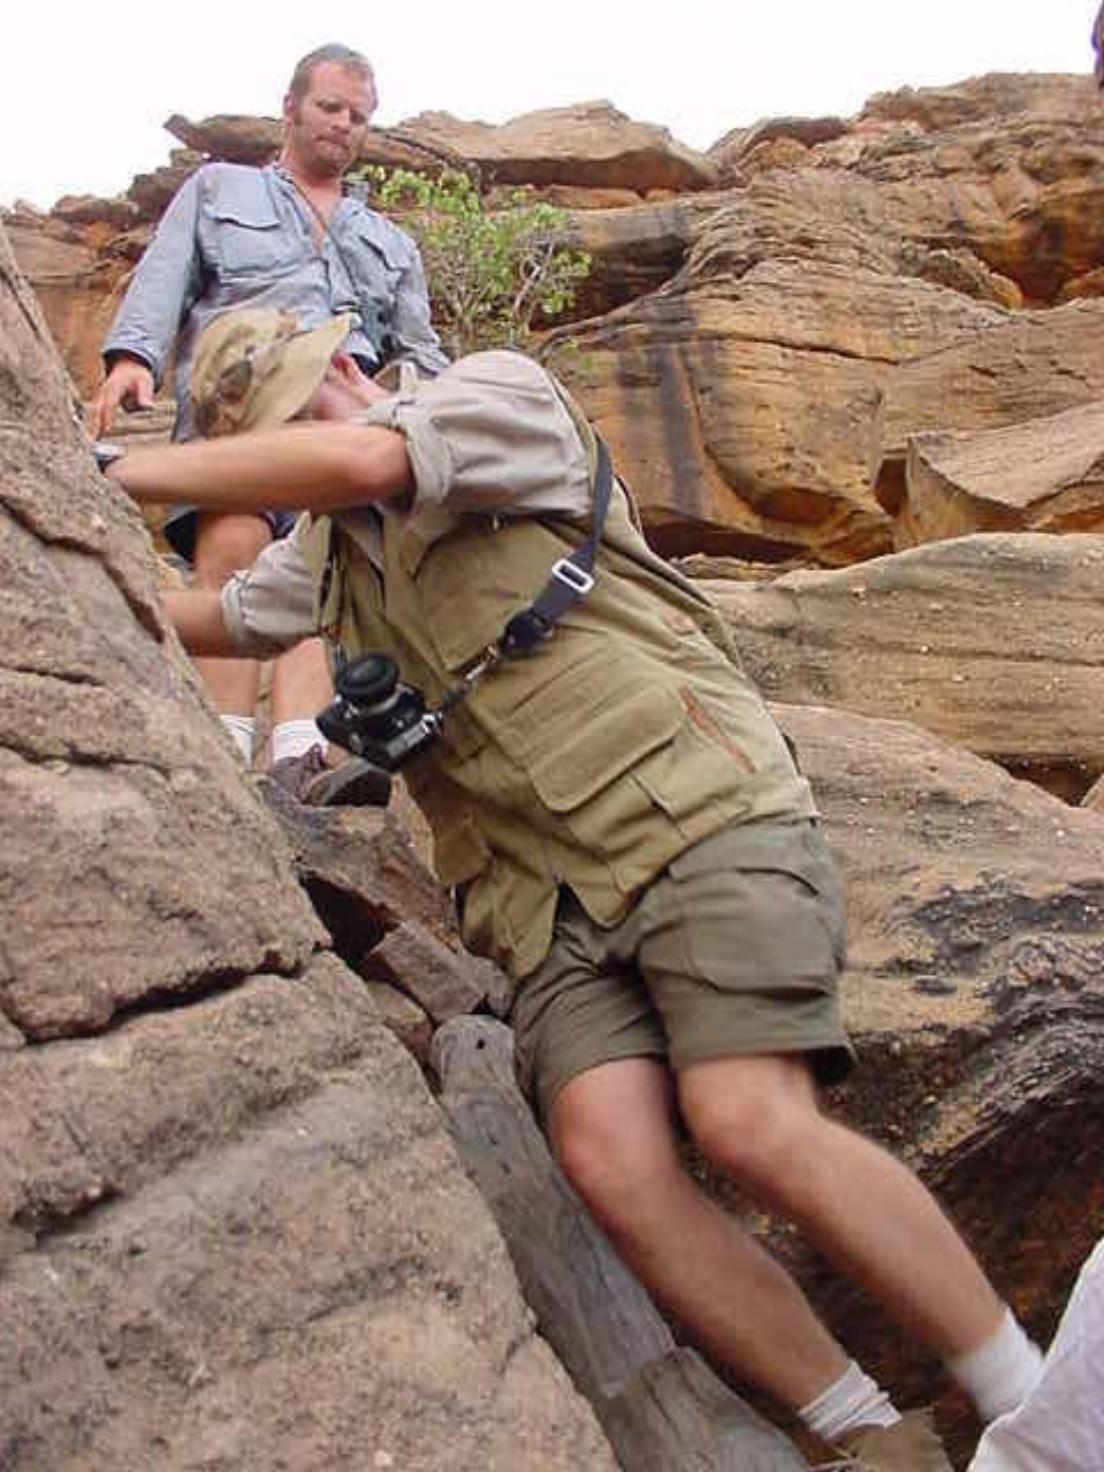 Carefully navigating the rocks